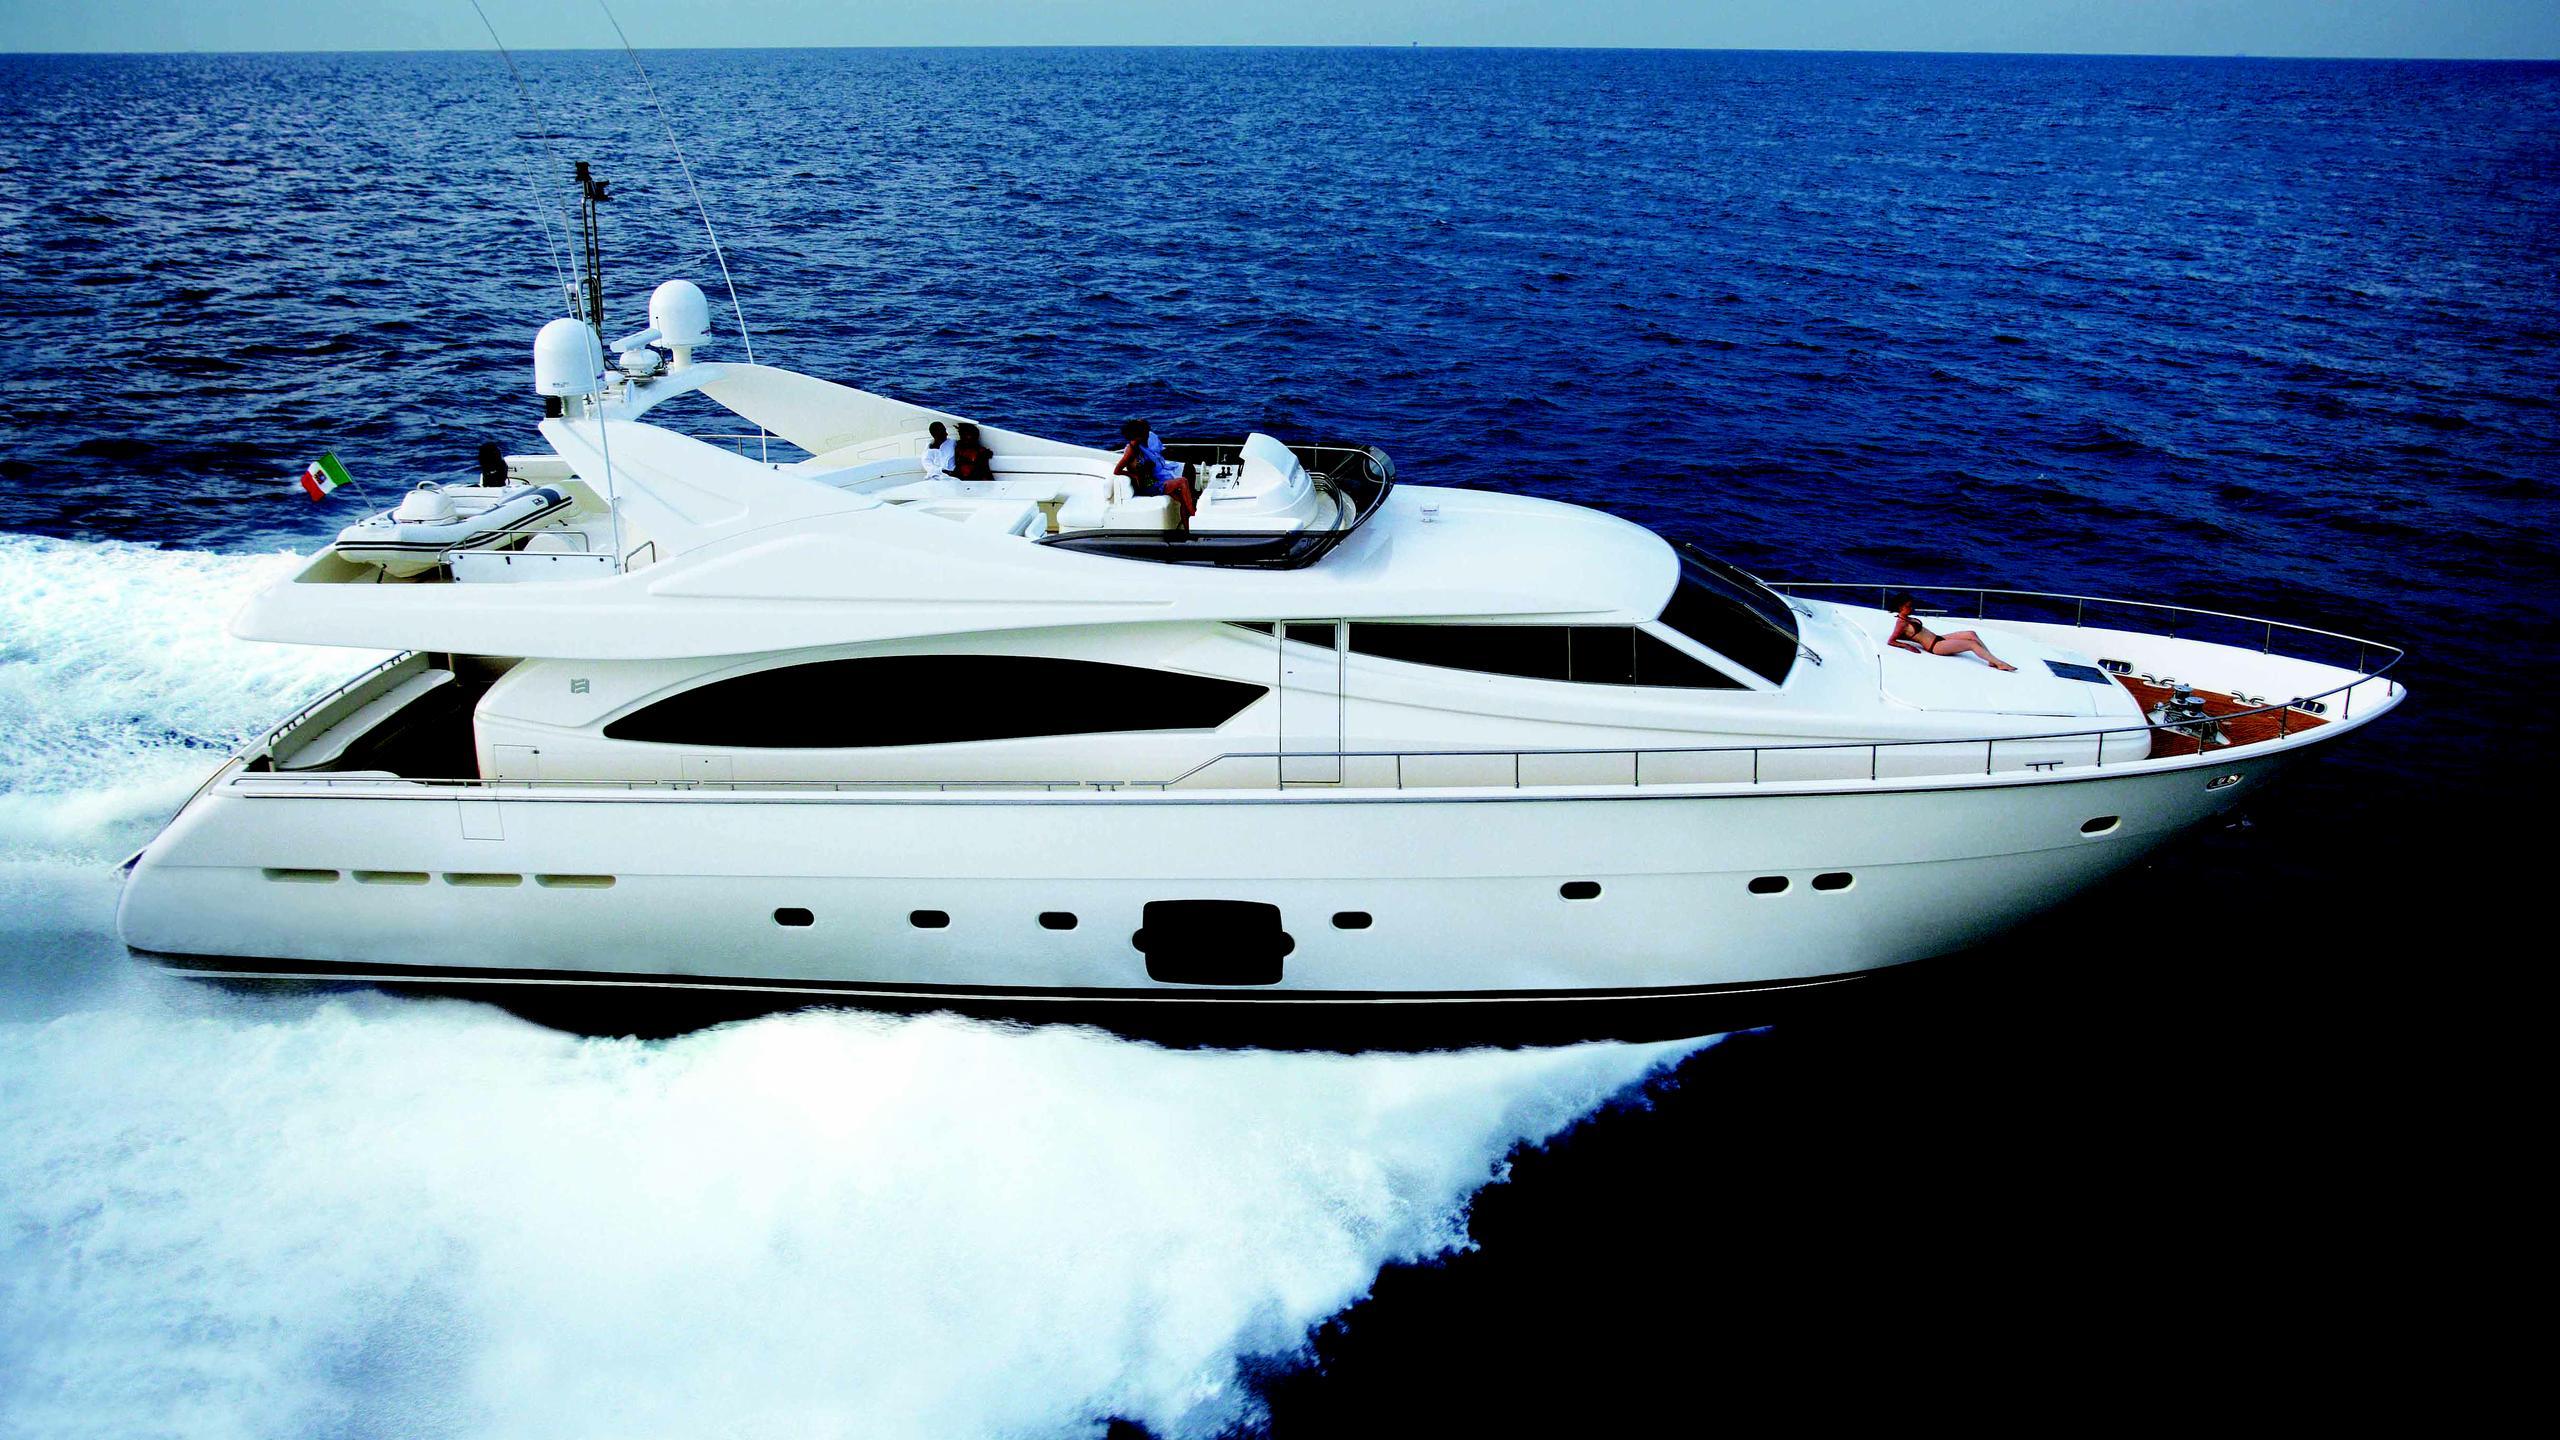 floating-asset-motor-yacht-ferretti-881-2007-27m-cruising